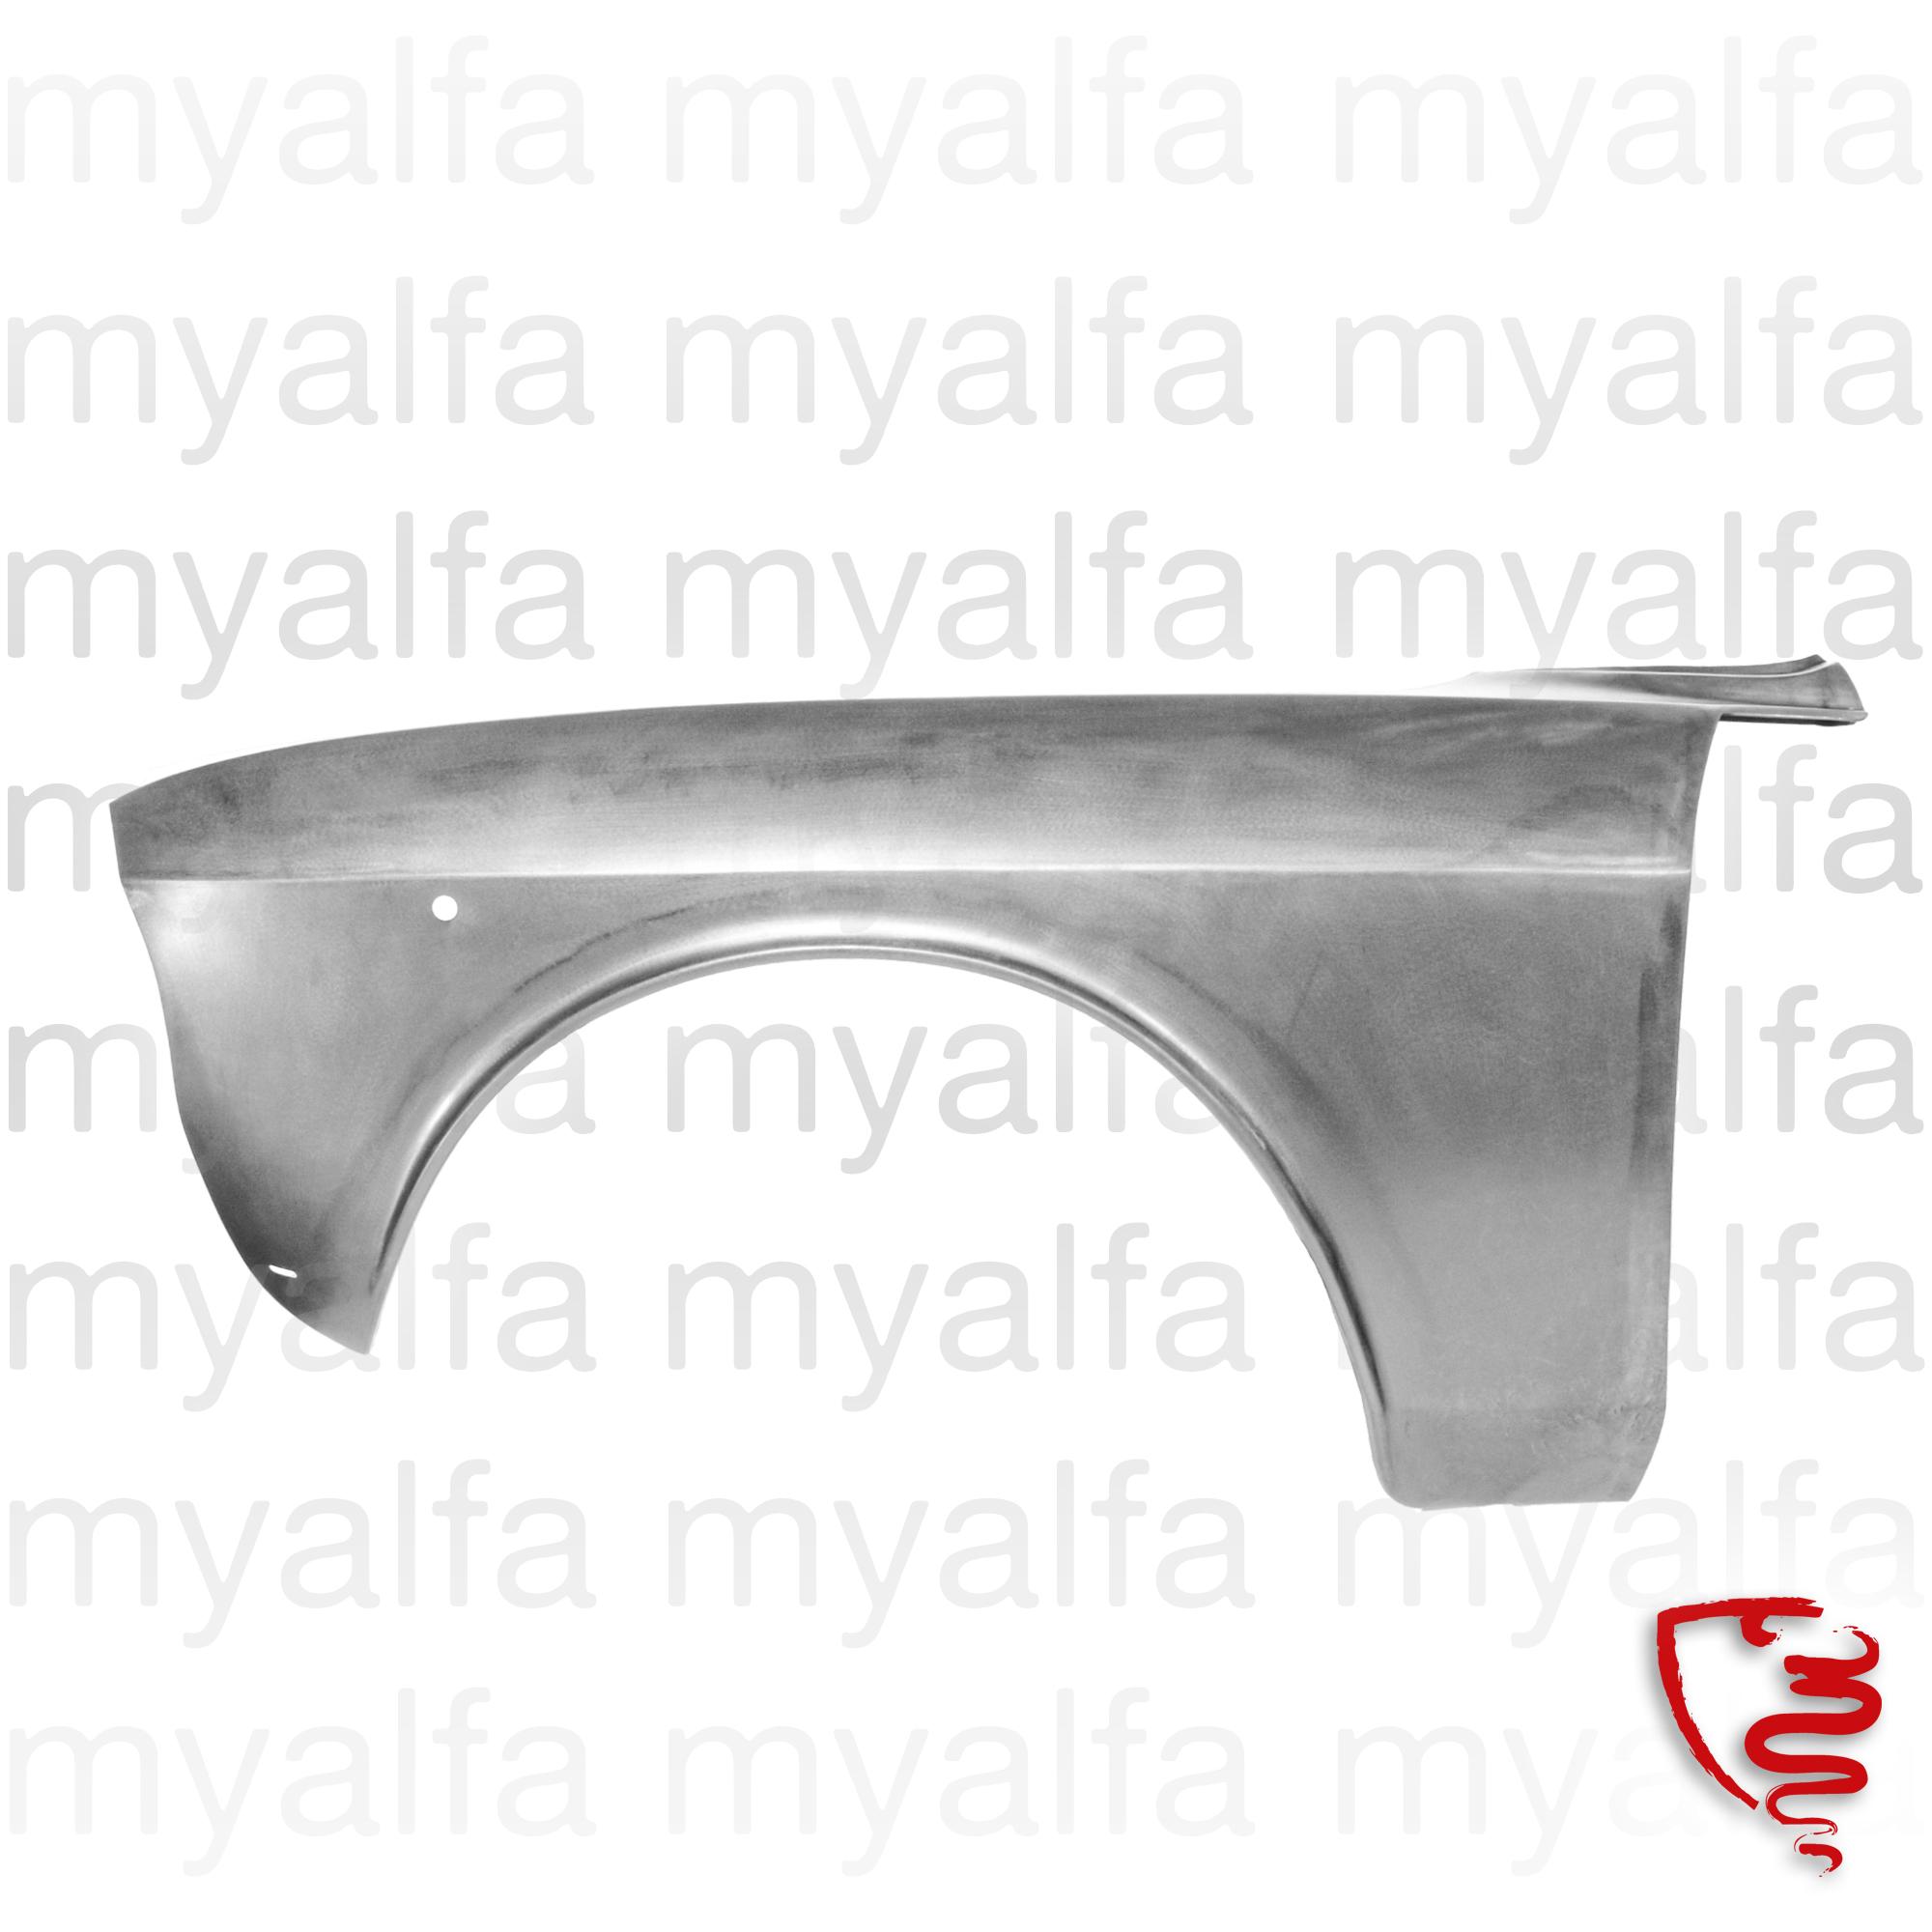 Panel Lamas Guard - Front esq.º for 105/115, Coupe, Body parts, Panels, Front fenders